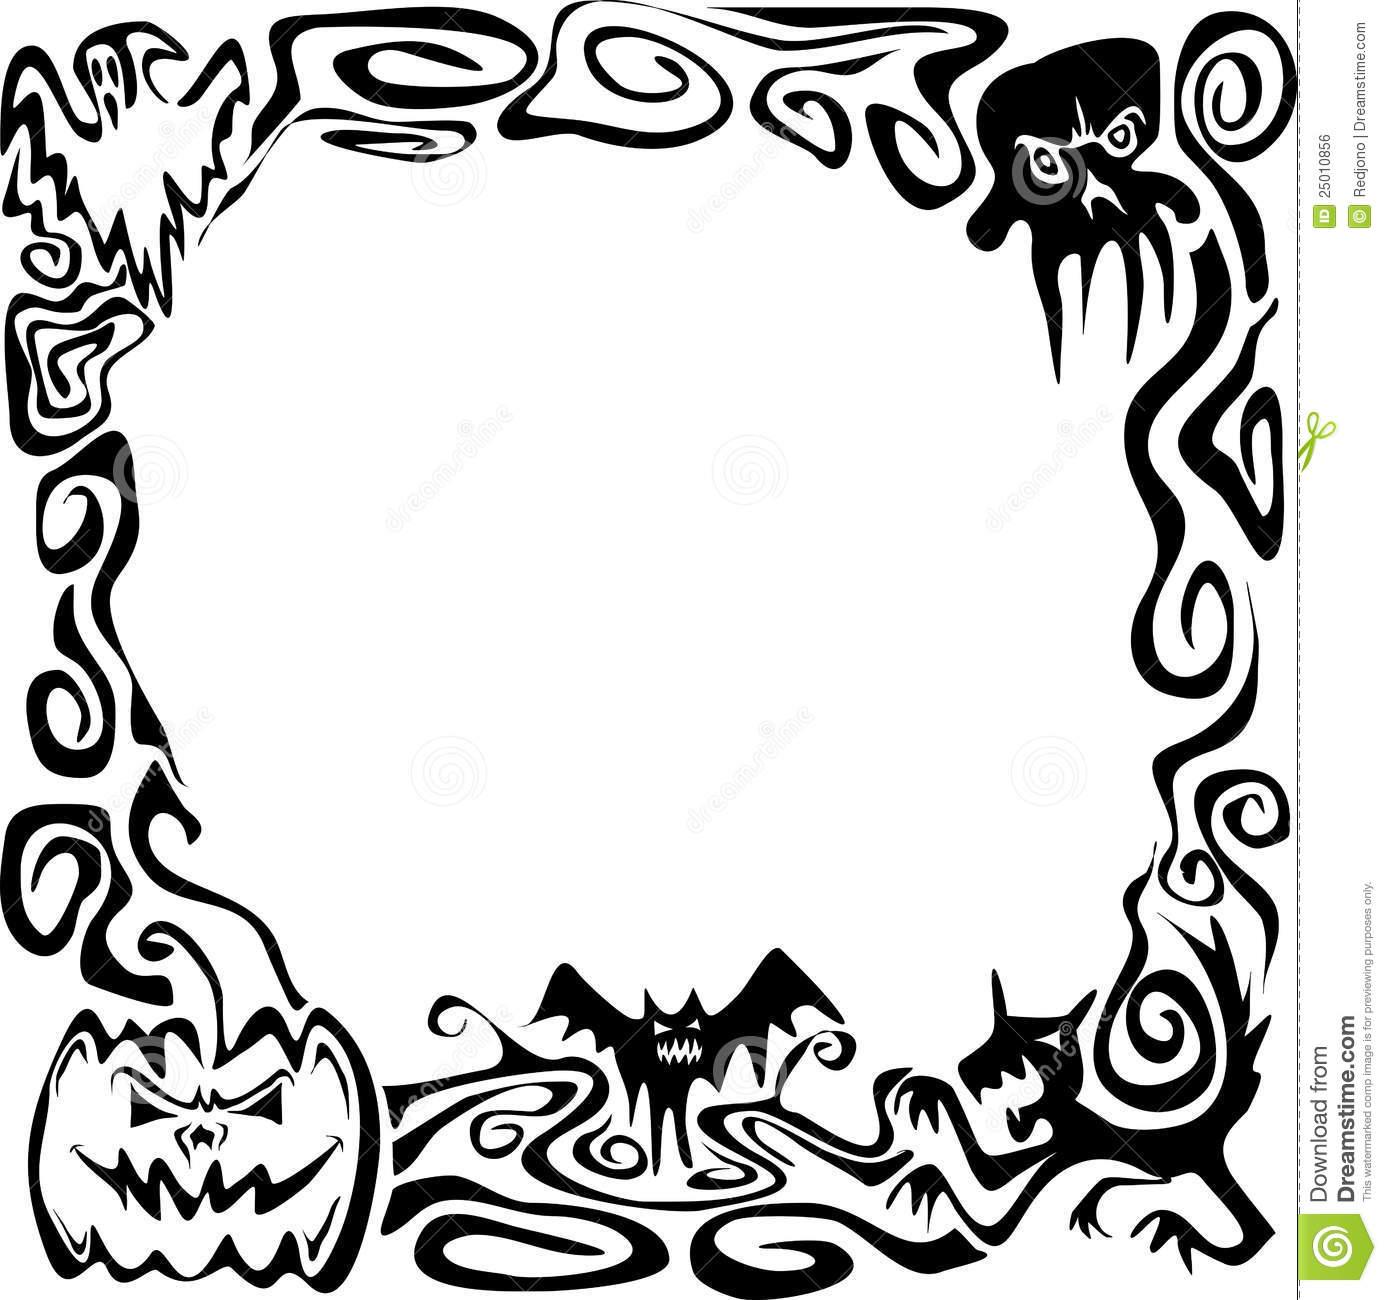 1387x1300 Black And White Halloween Border Clip Art Clipart Free